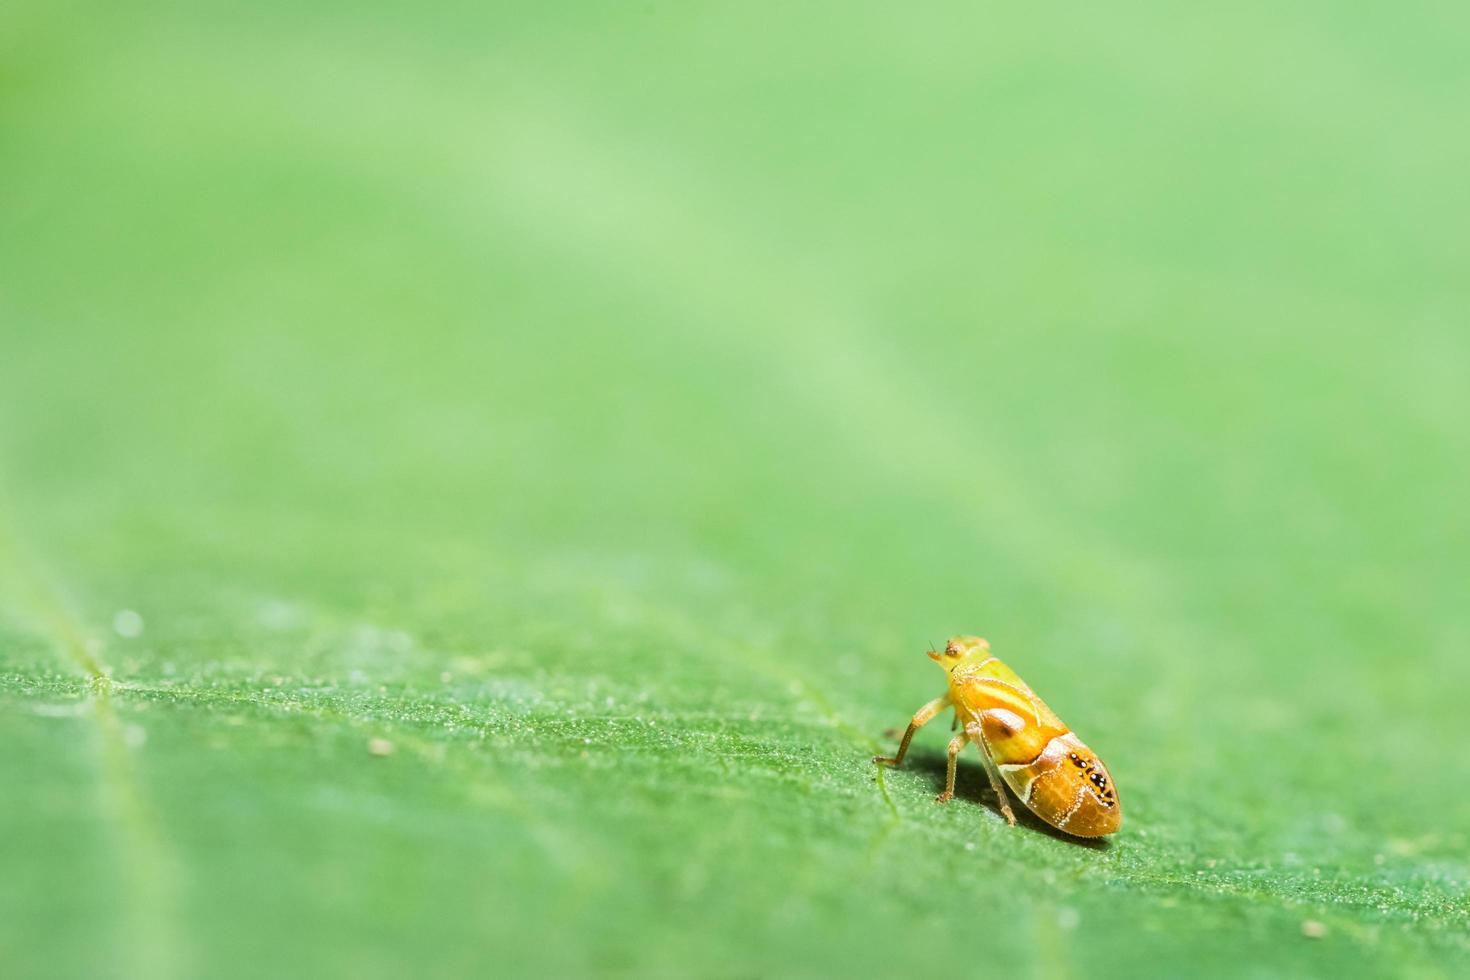 insecte cicadelle traverse feuille photo